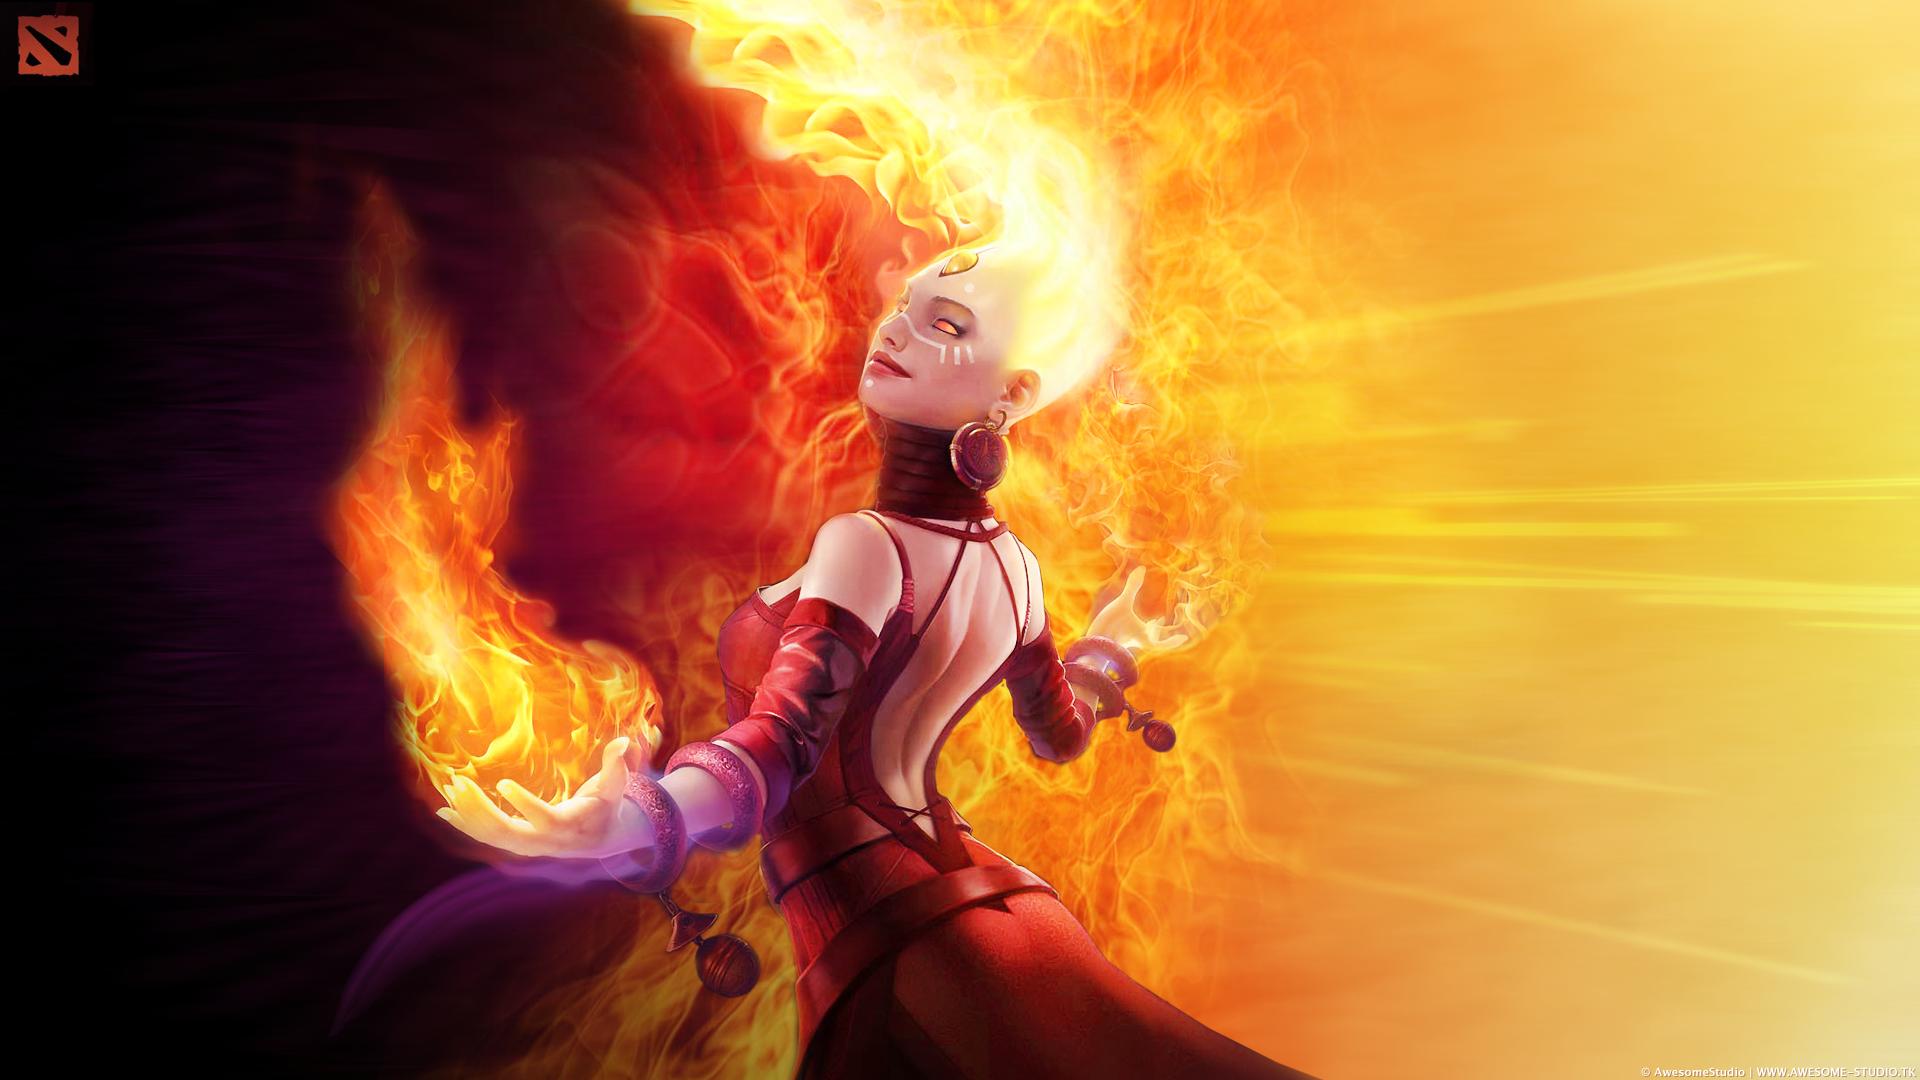 remaking the lina arcana fiery soul of the slayer dota2